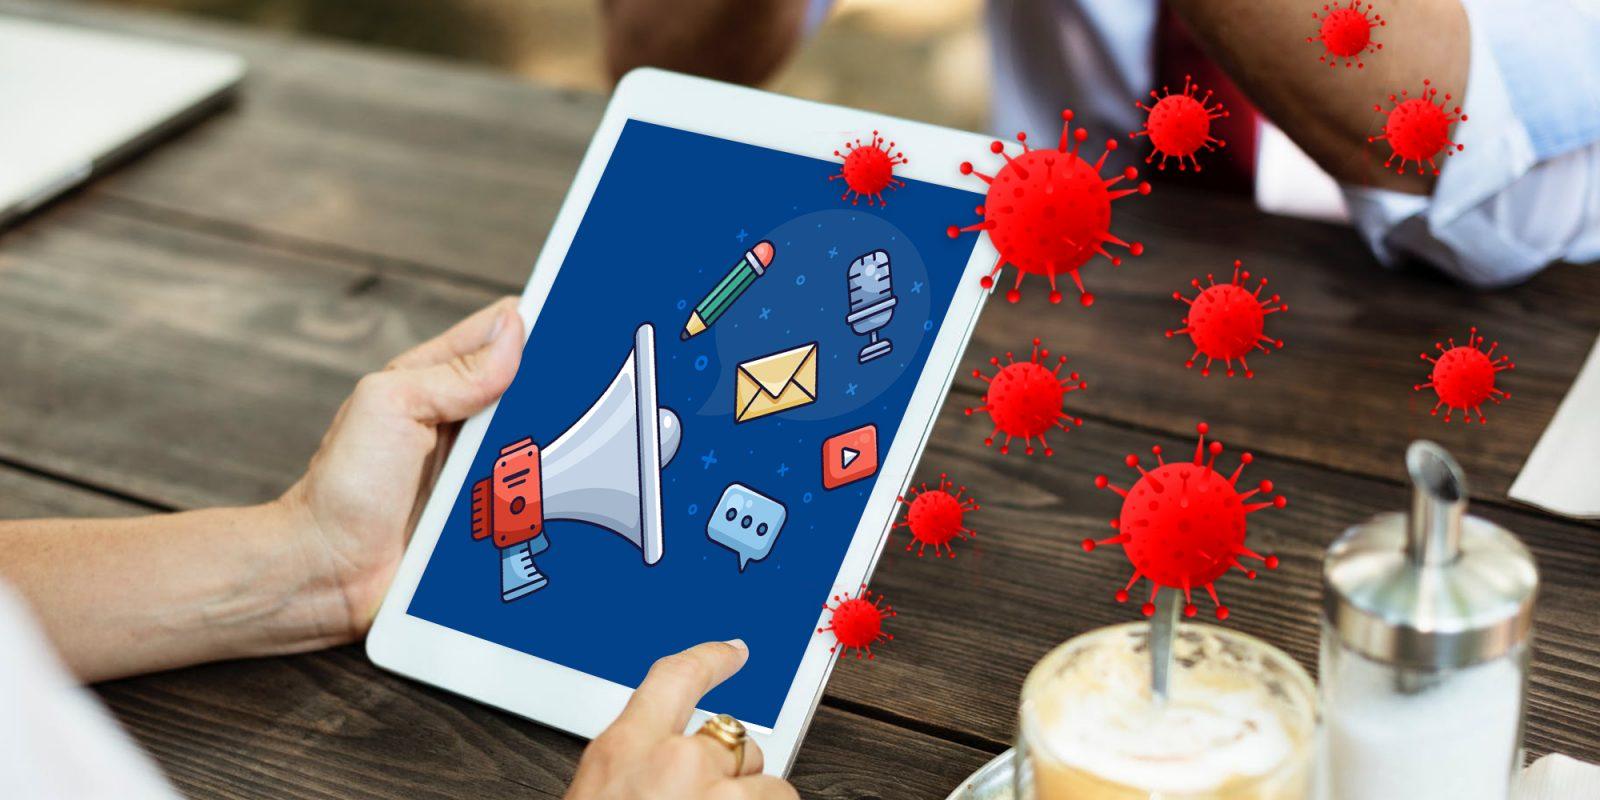 Why Shouldn't We Stop Digital Marketing During Coronavirus